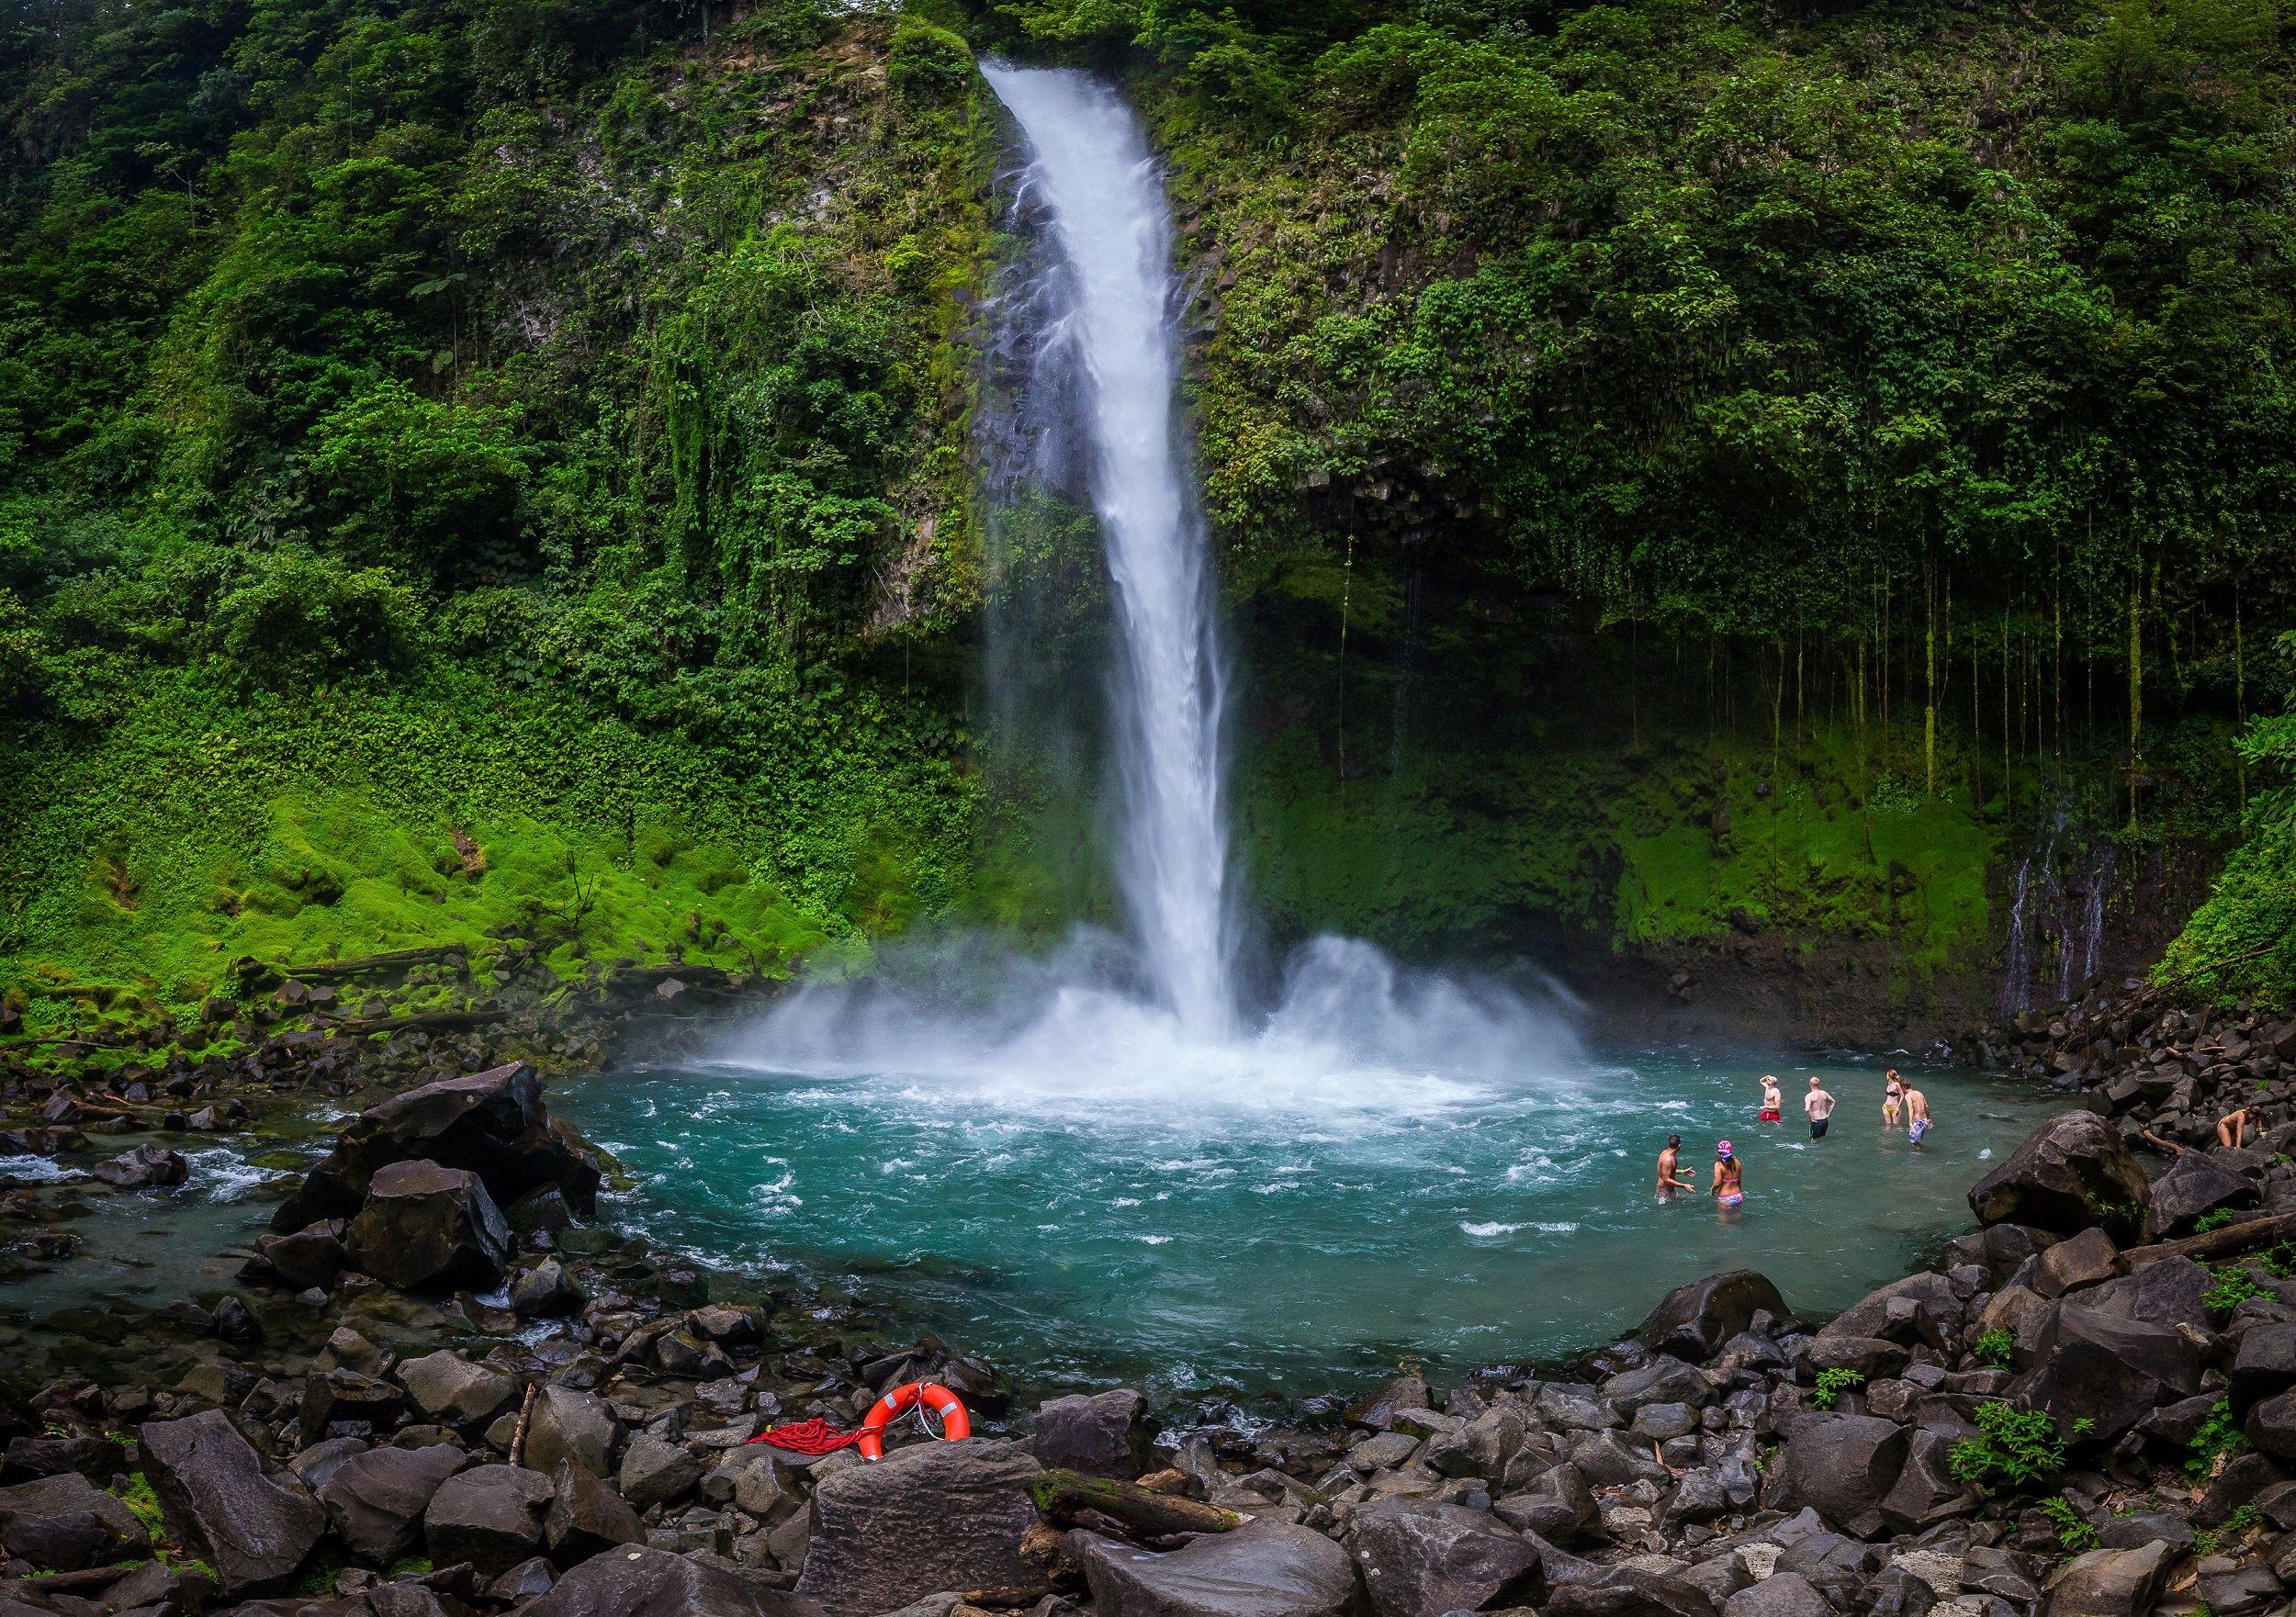 Peñas Blancas River Safari And La Fortuna Waterfall Tour From La Fortuna & Arenal_1